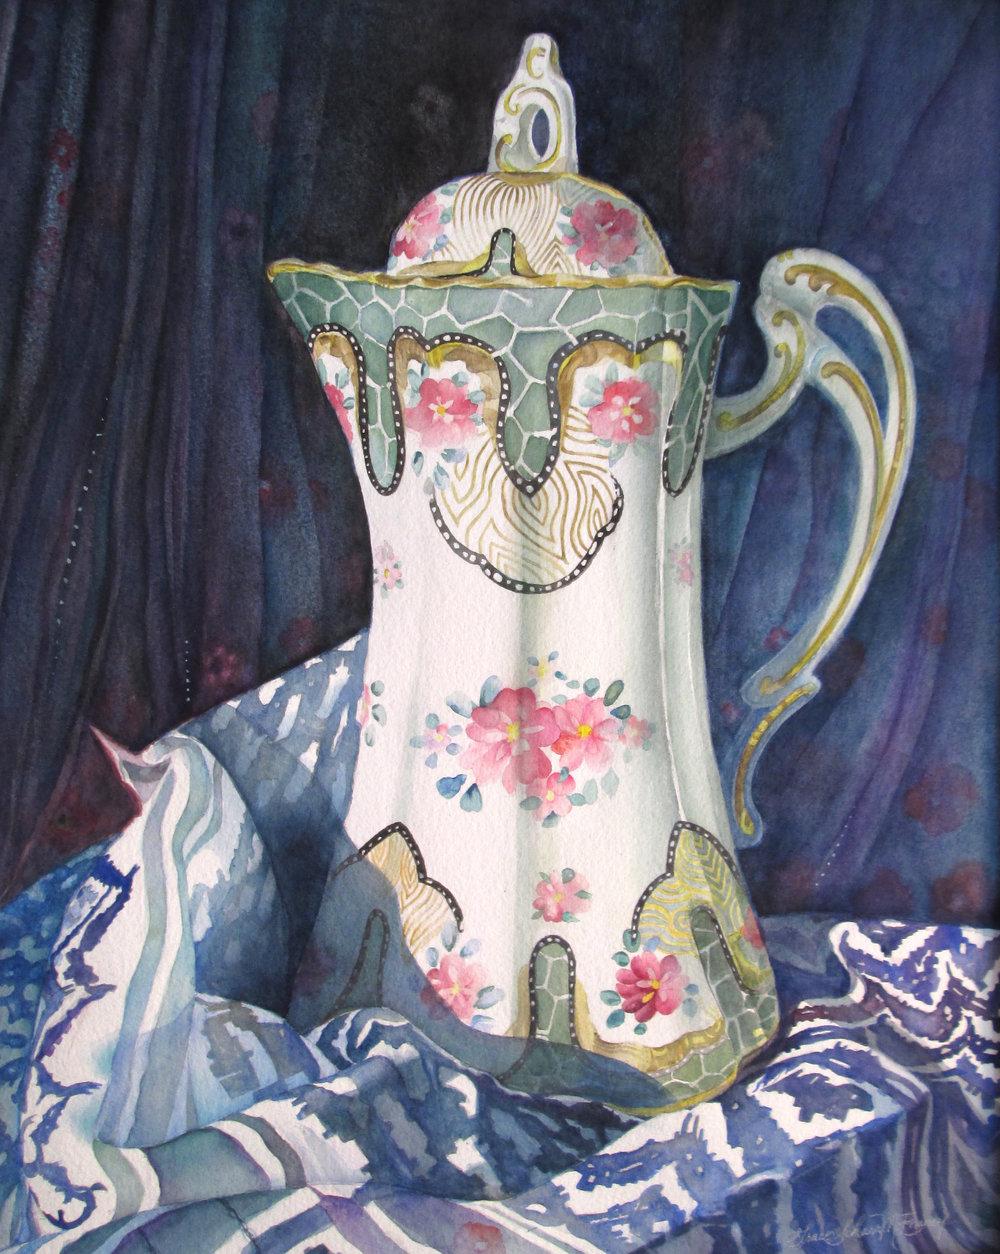 """Vintage Teapot on Headscarf"" 26"" x 31"""